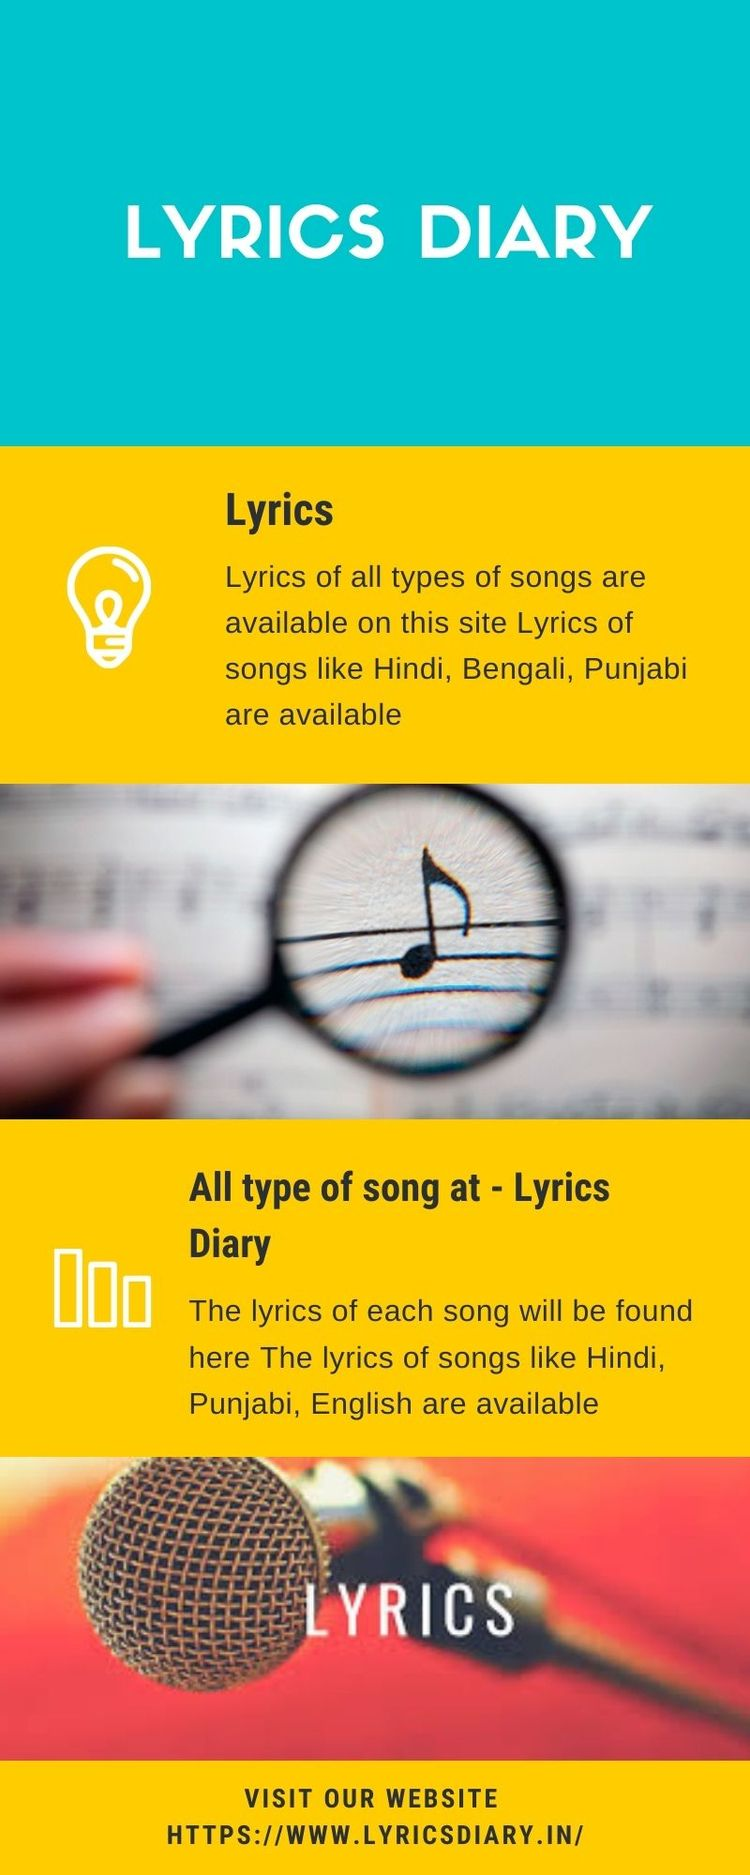 Lyrics Diary types songs site H - lyricsdiary | ello